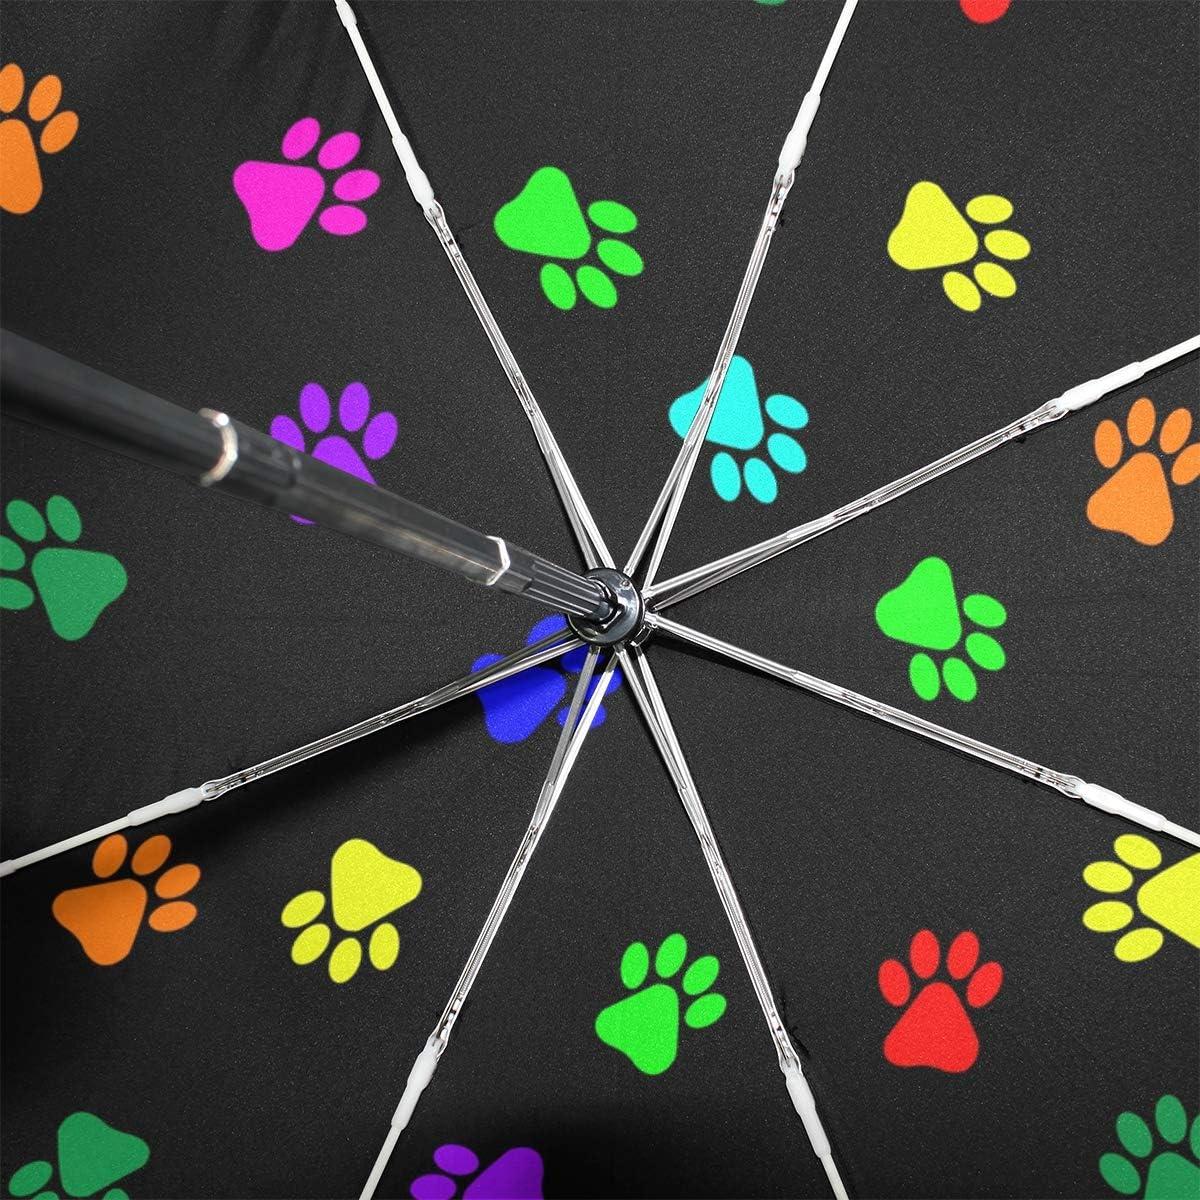 Black Glue Anti UV Coating ANINILY Colorful Footprints On Black Folding Umbrella Windproof Compact Travel Umbrella For Women Men